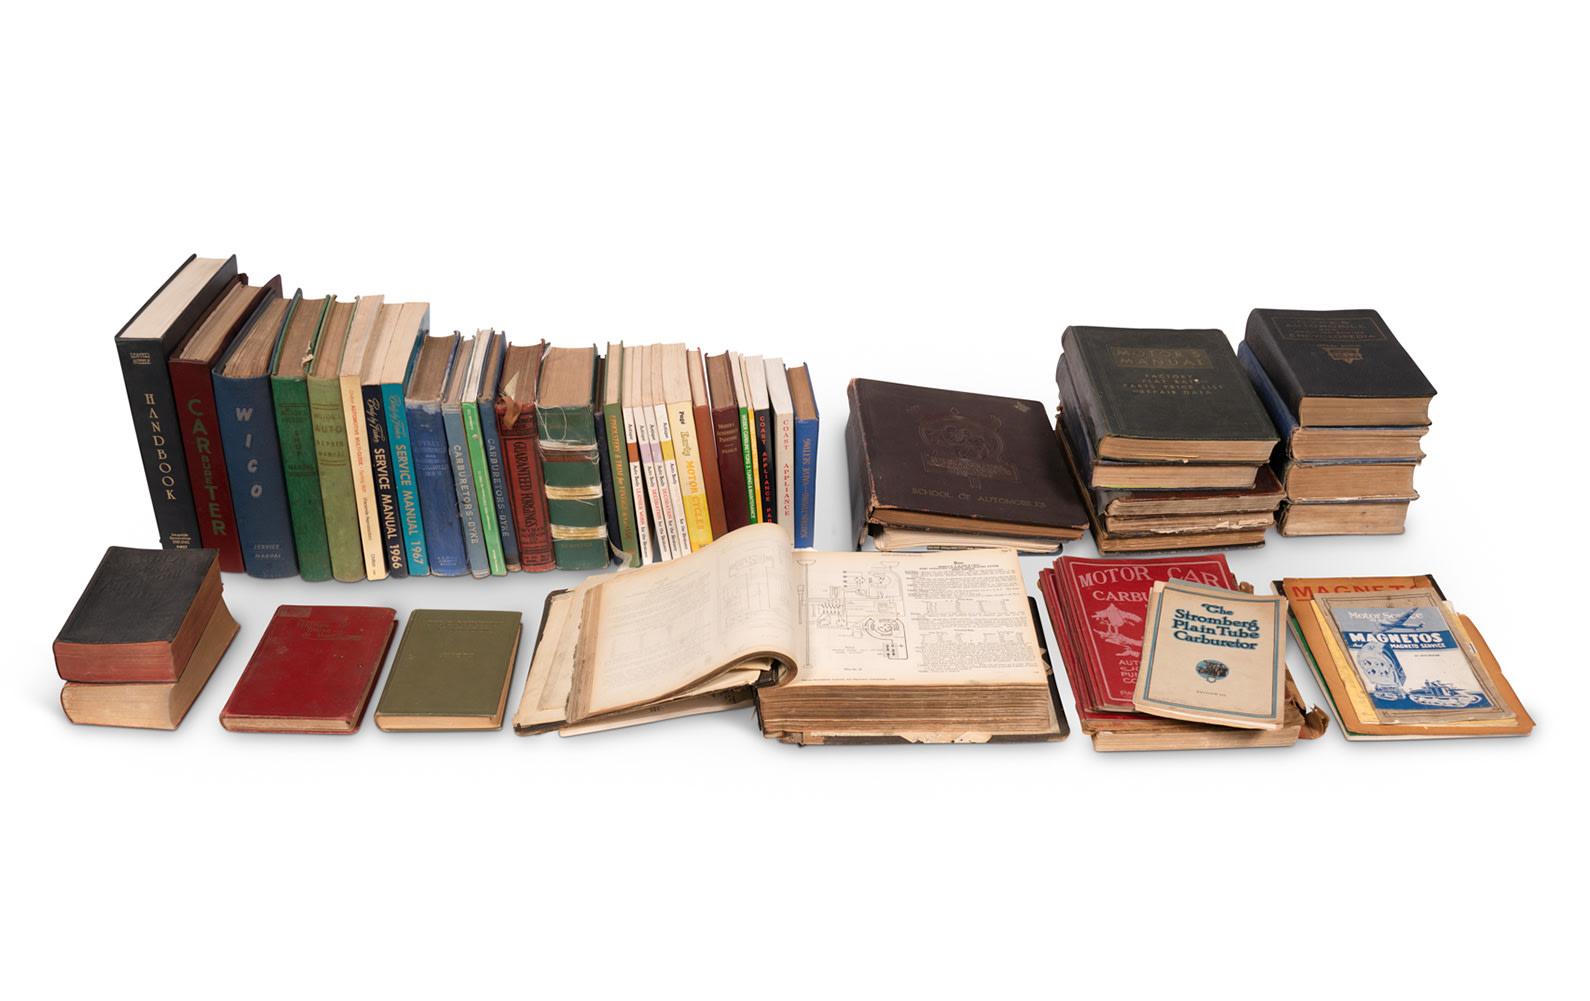 Prod/O21E - Phil Hill C 2021/C0049_Various Auto Repair Literature and Manuals/C0049_Auto_Repair_Literature_Manuals_1_cdlqvw